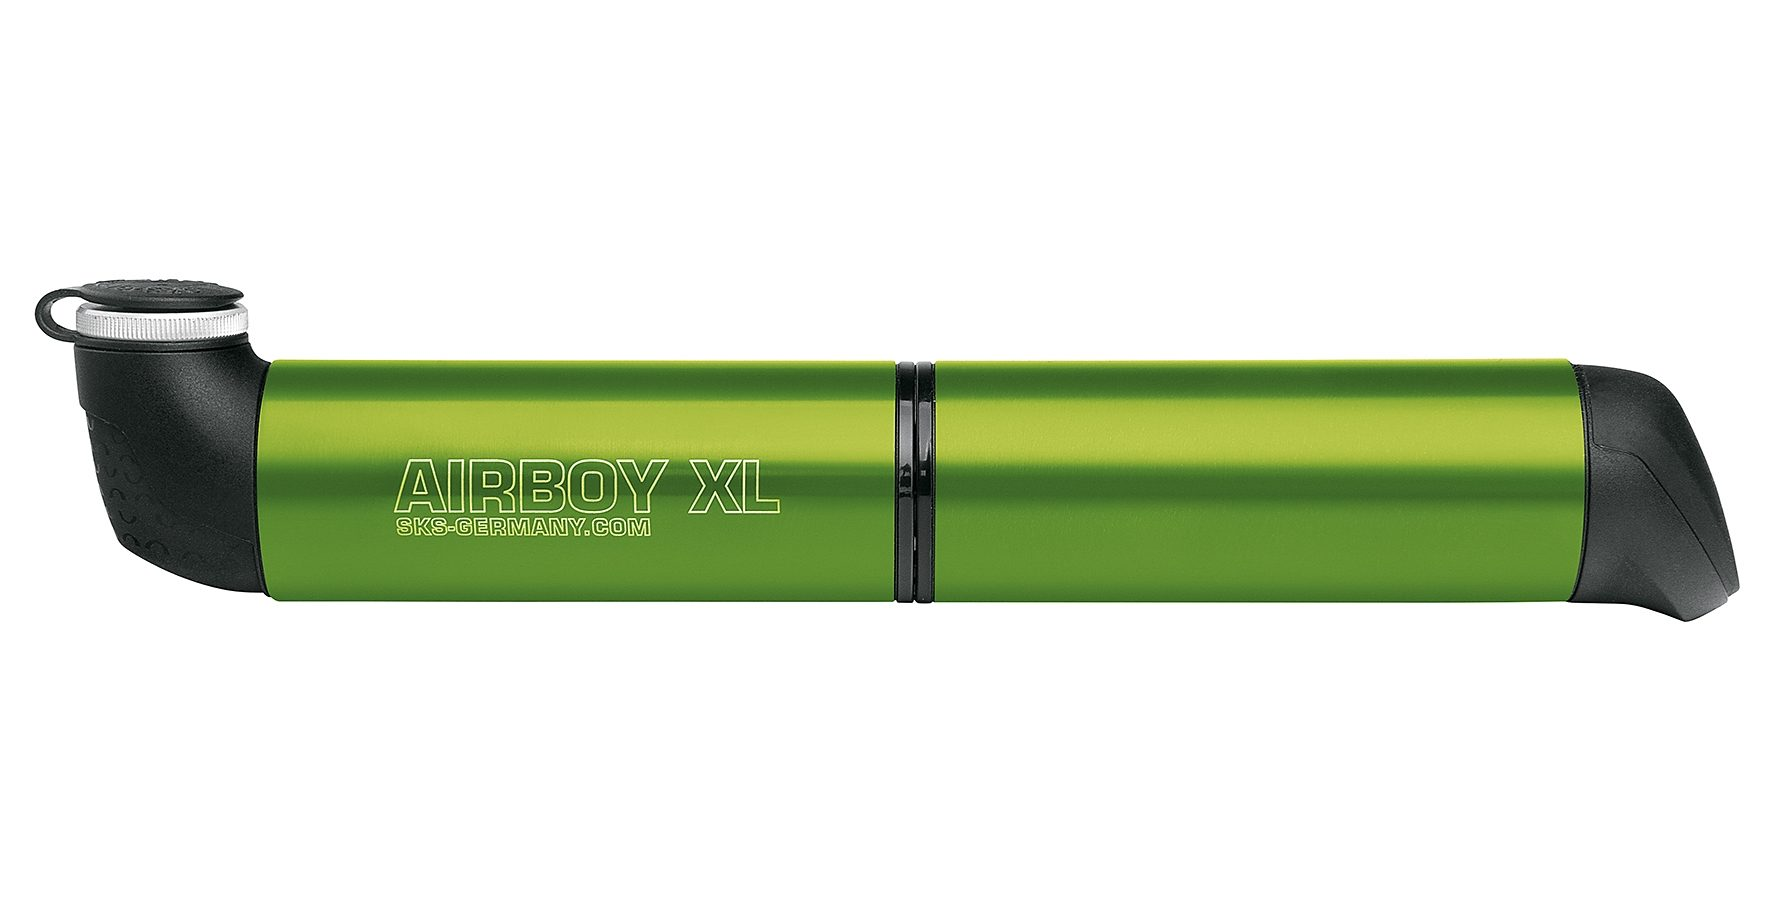 SKS Fahrradpumpe »Airboy XL Minipumpe«